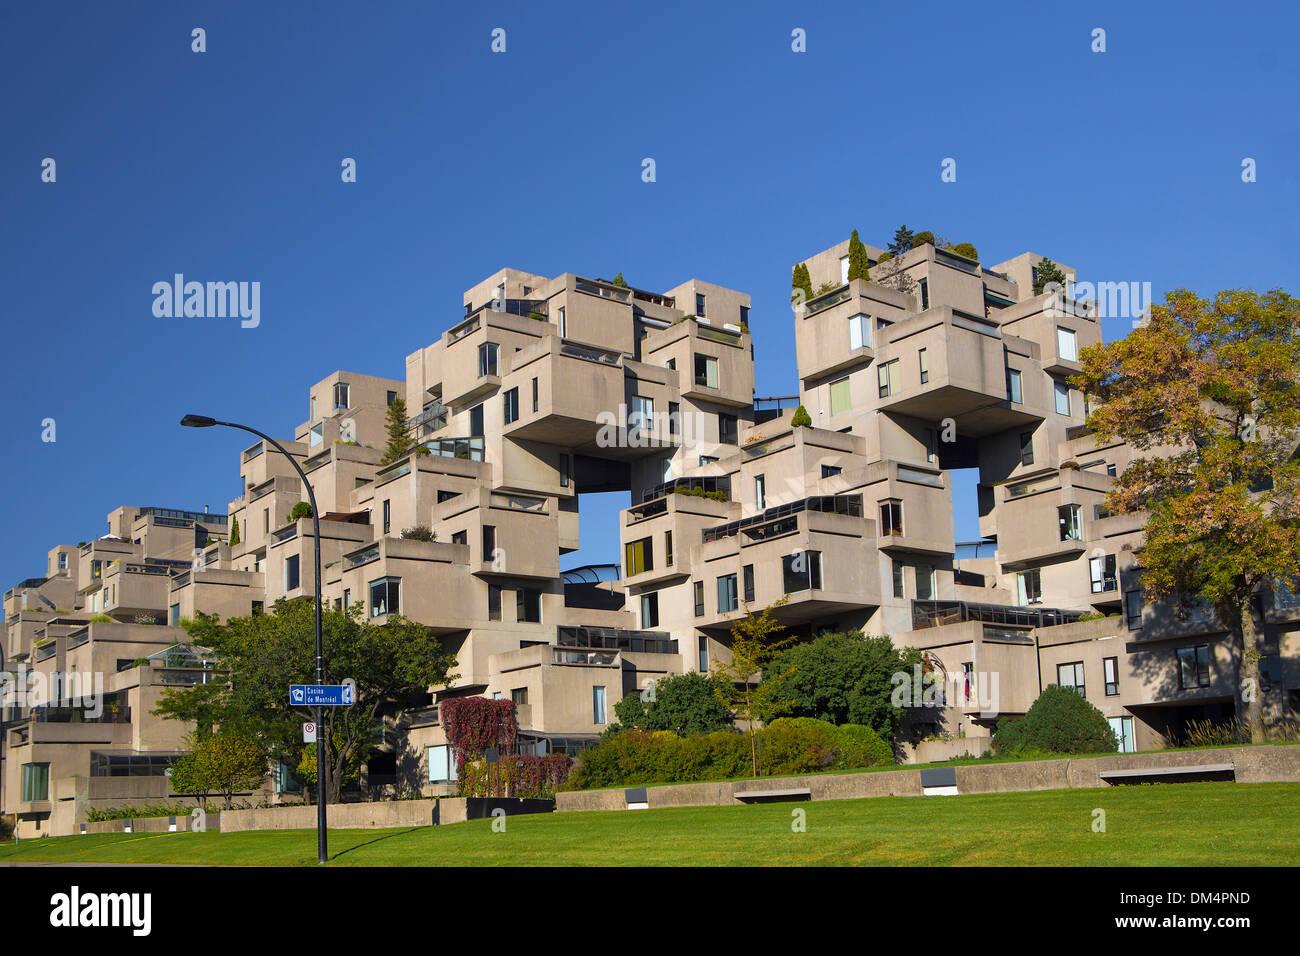 Building canada north america montreal quebec for Landscape architecture canada